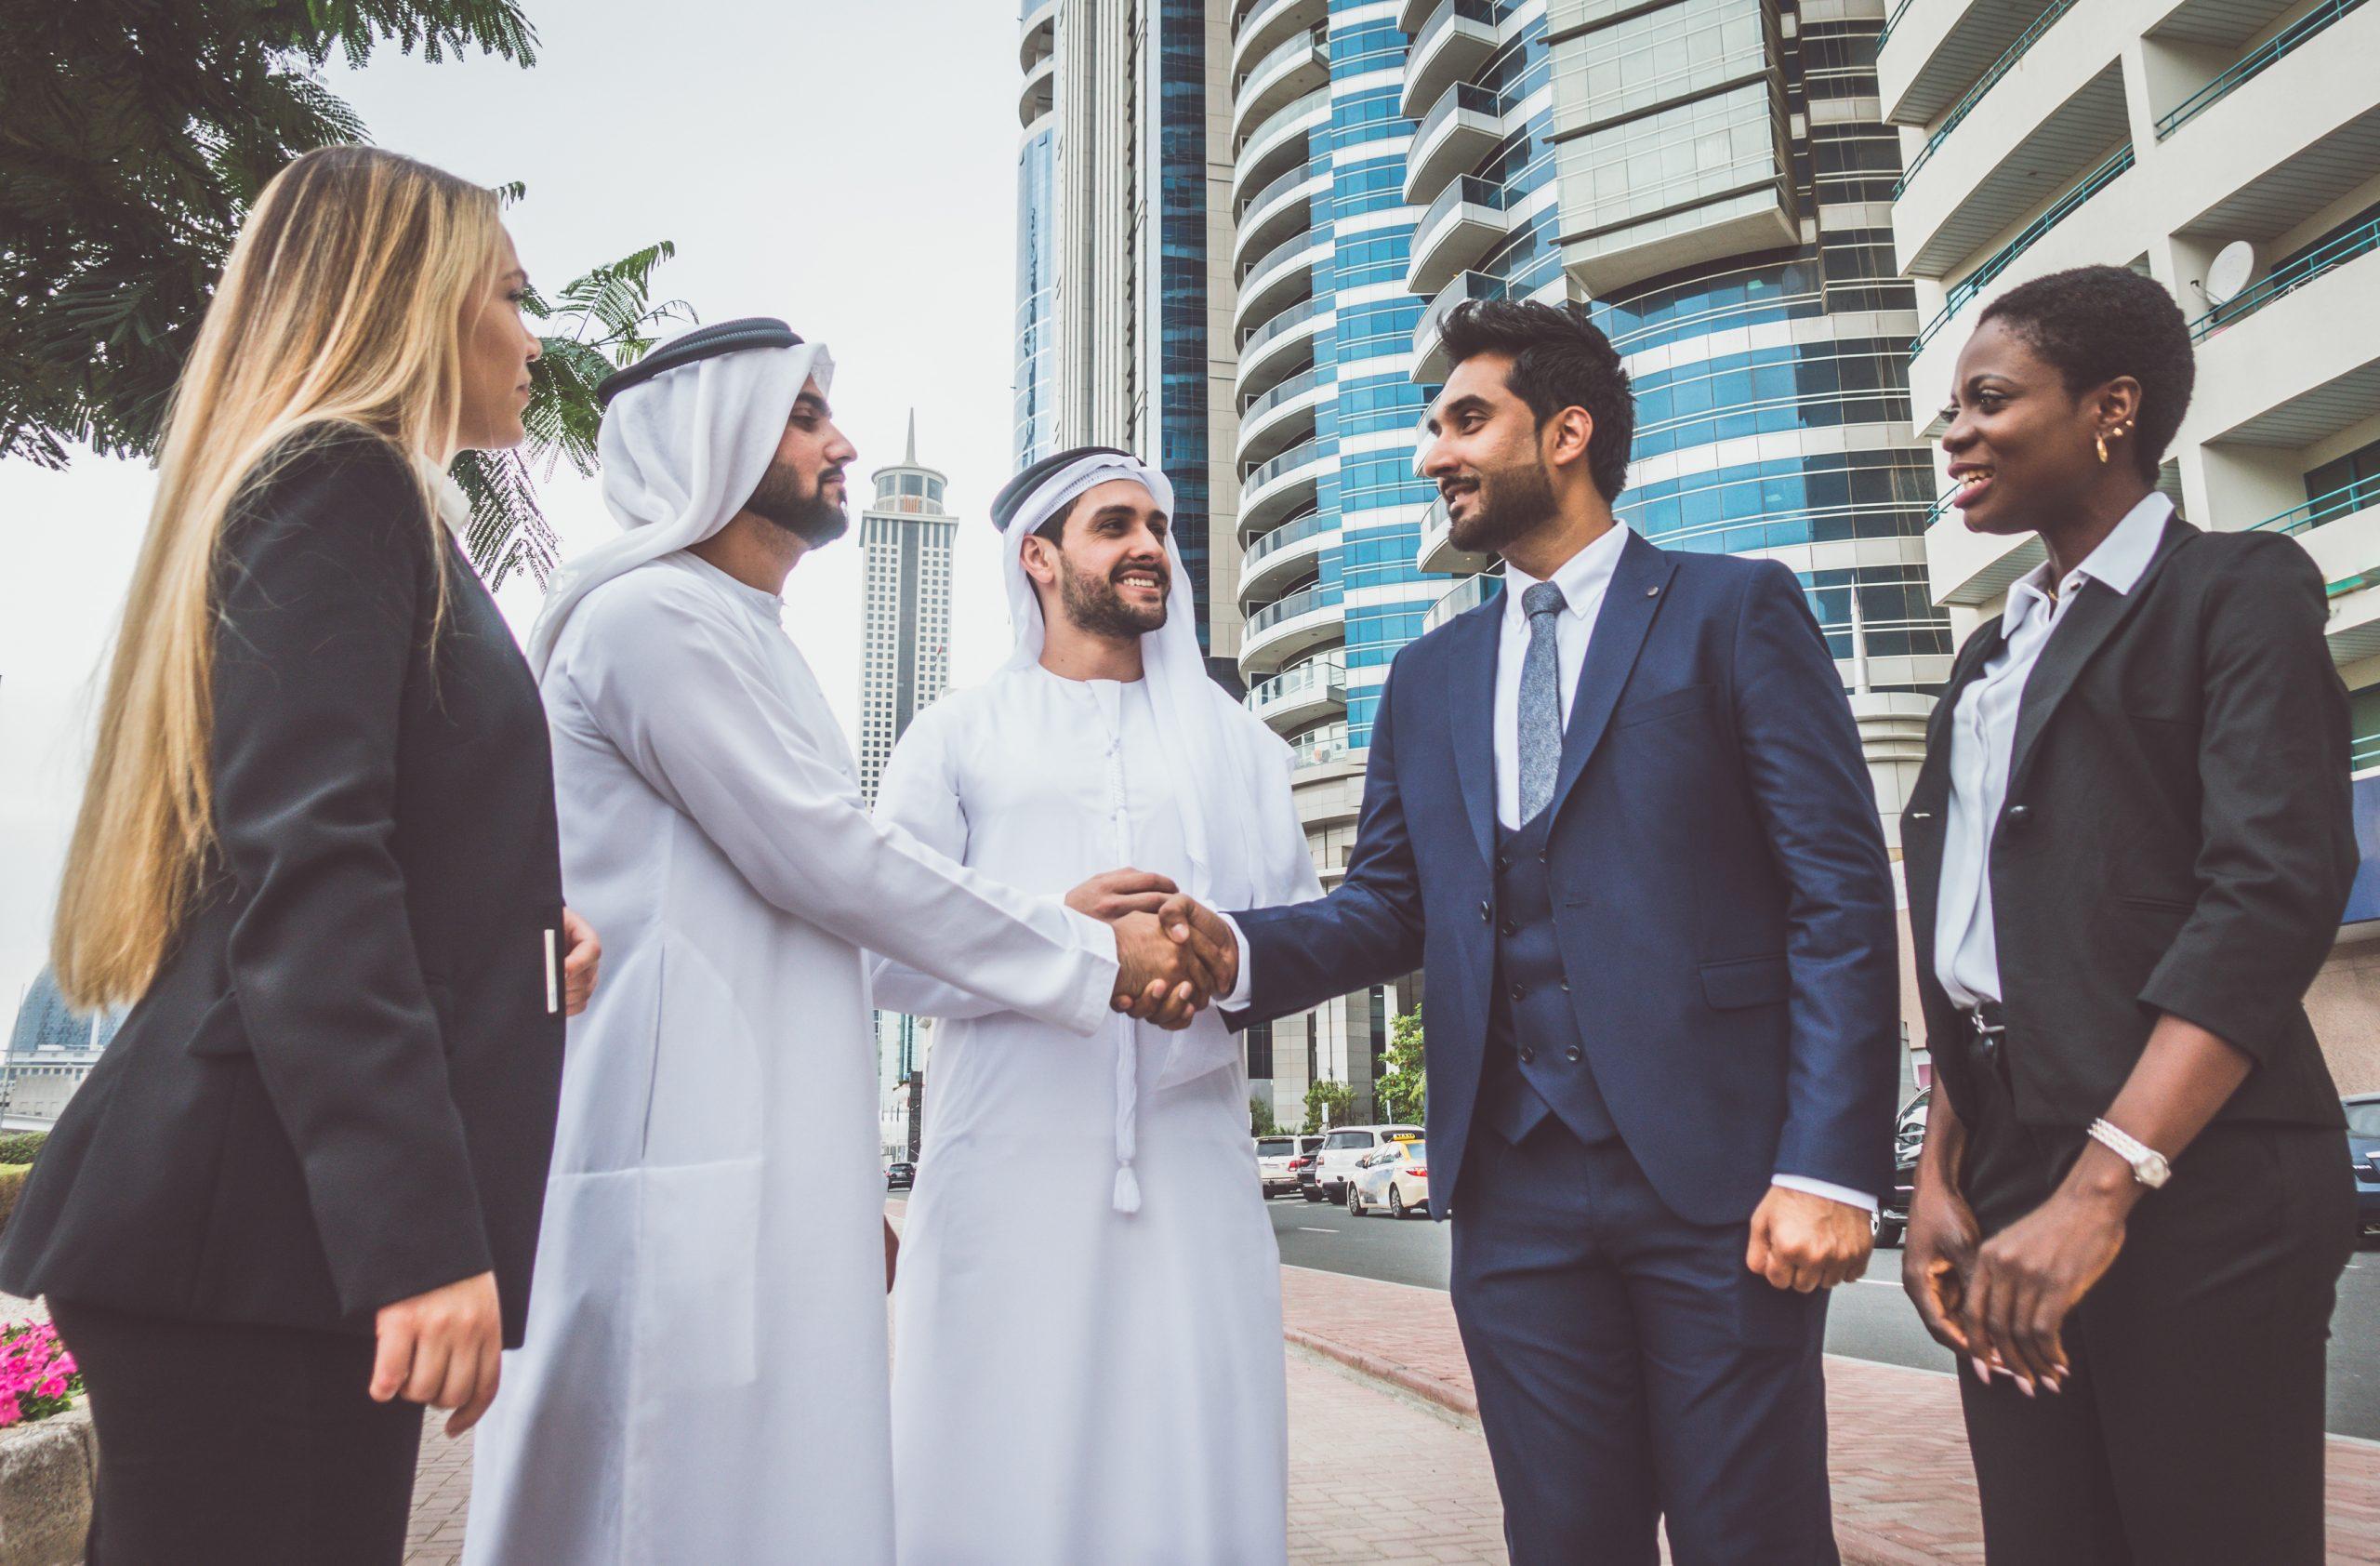 DubaiNext SME crowdfunding